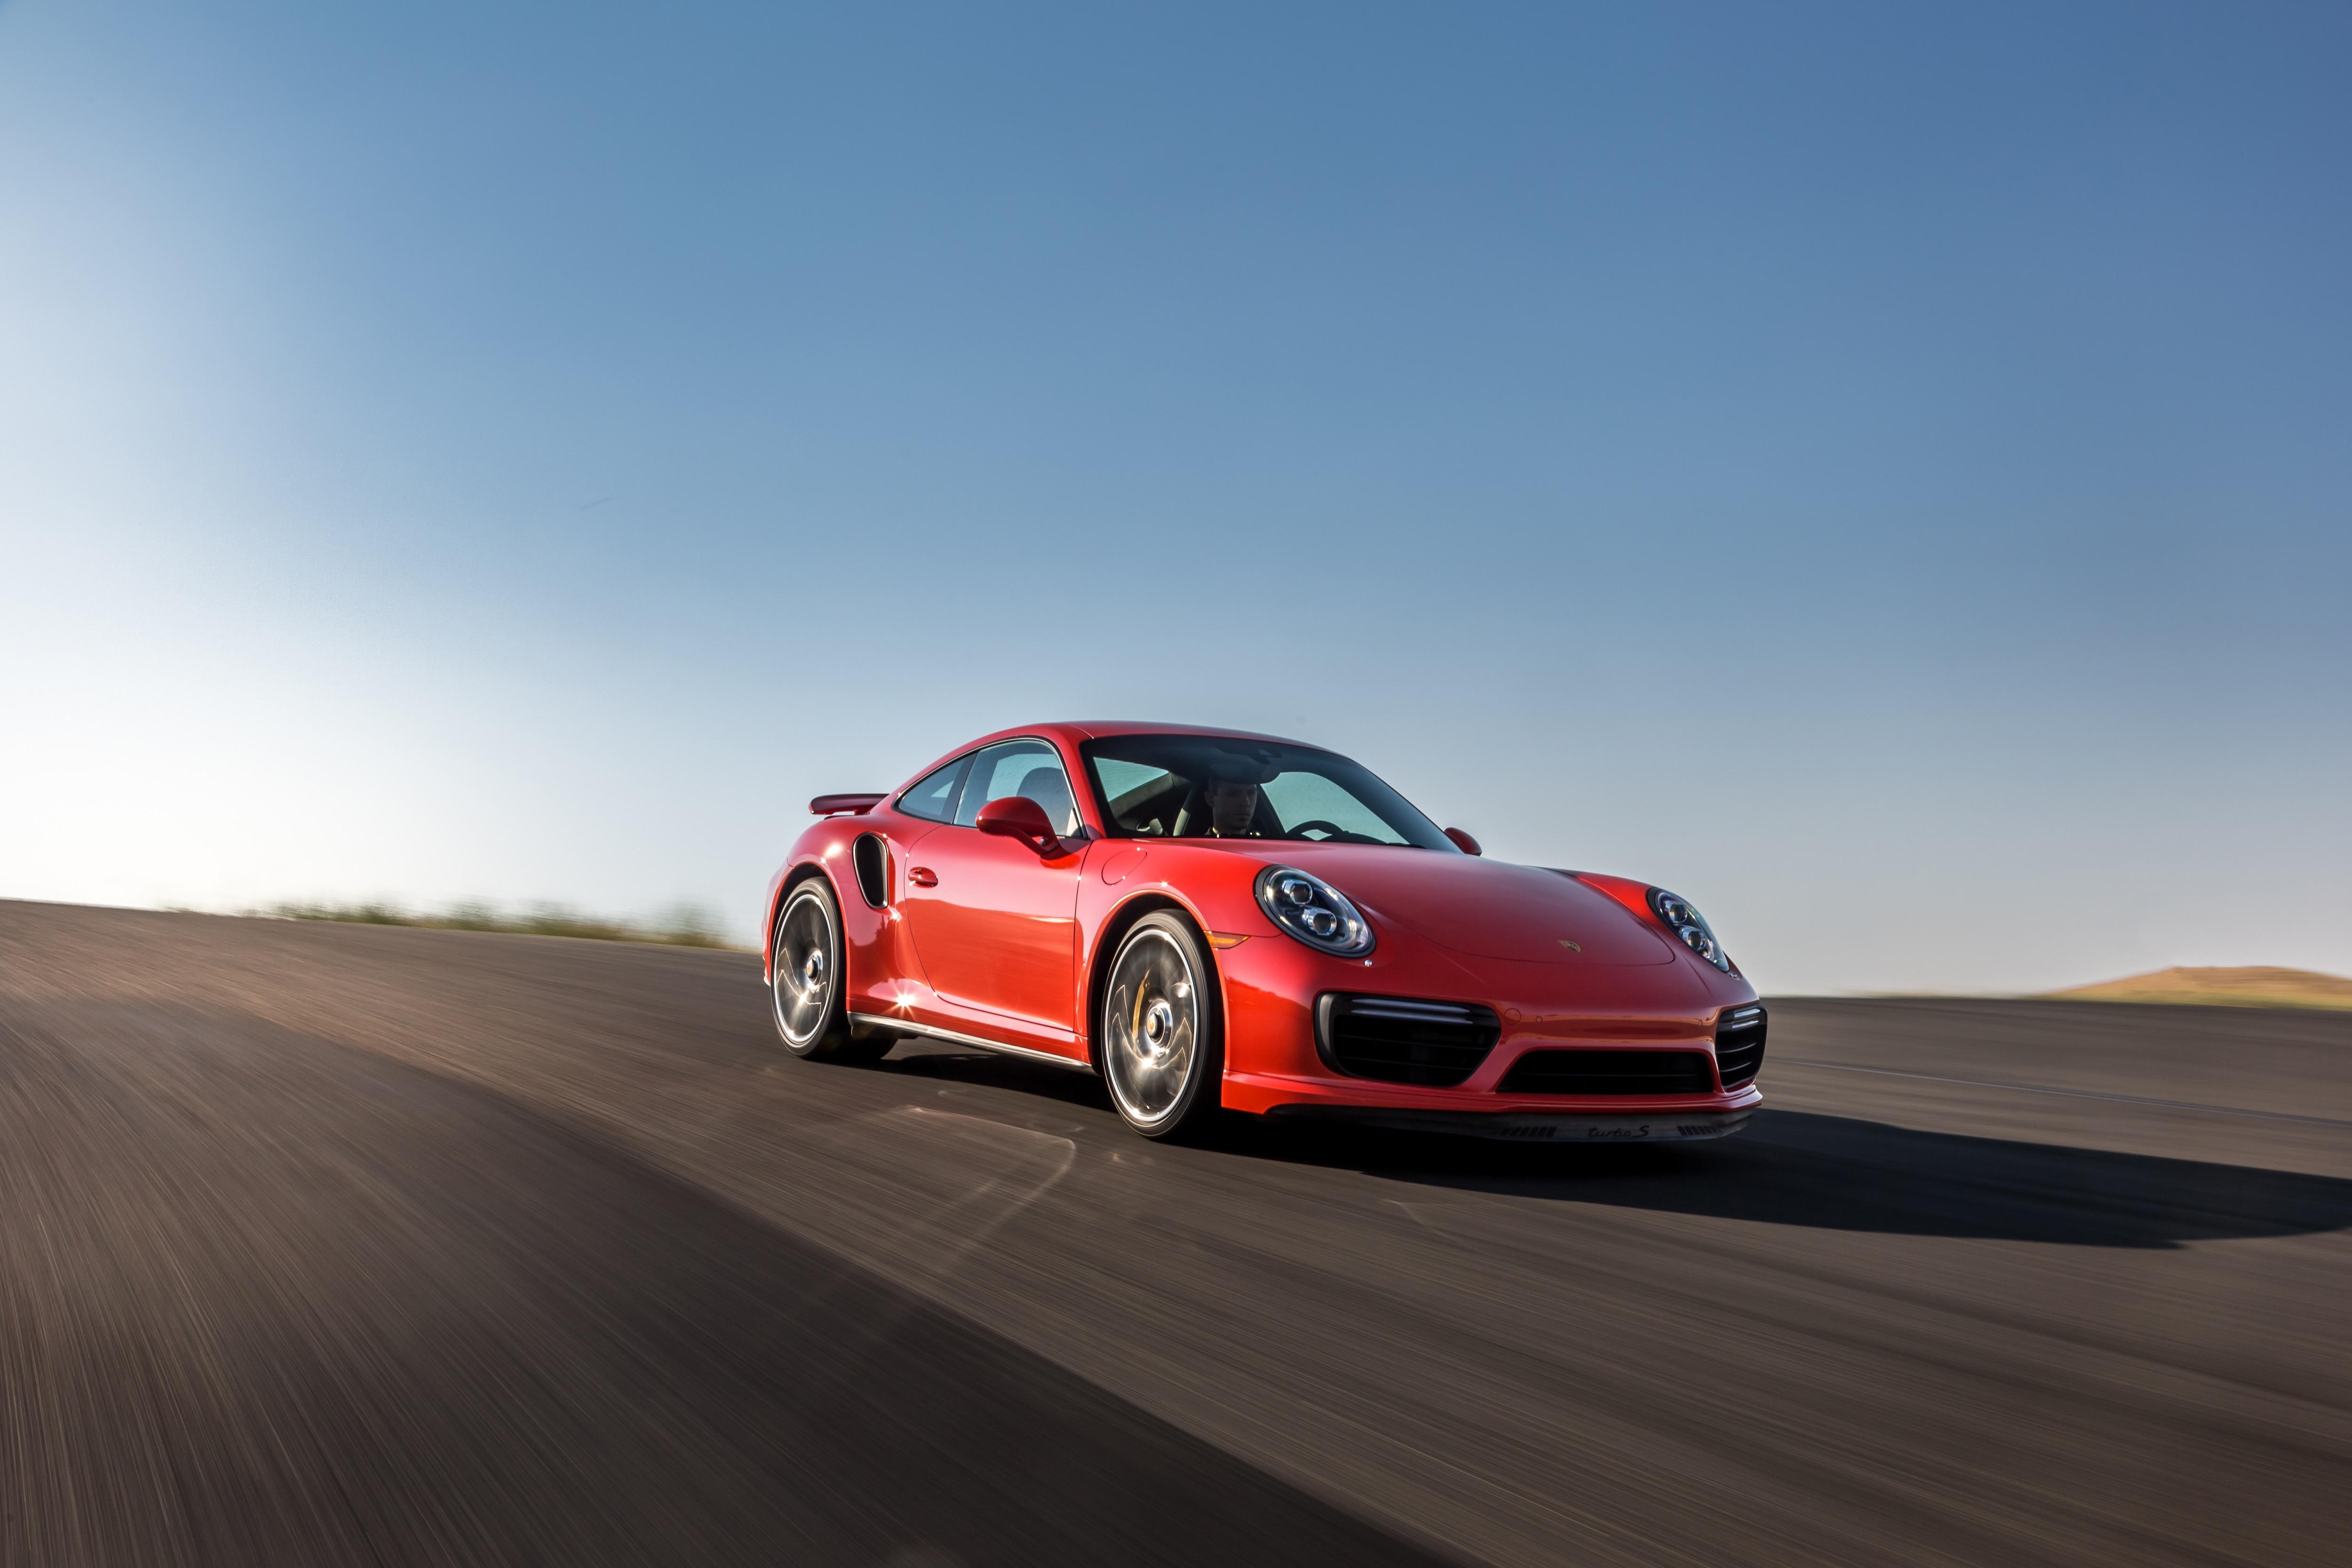 2017 porsche 911 turbo turbo s pack even more power. Black Bedroom Furniture Sets. Home Design Ideas